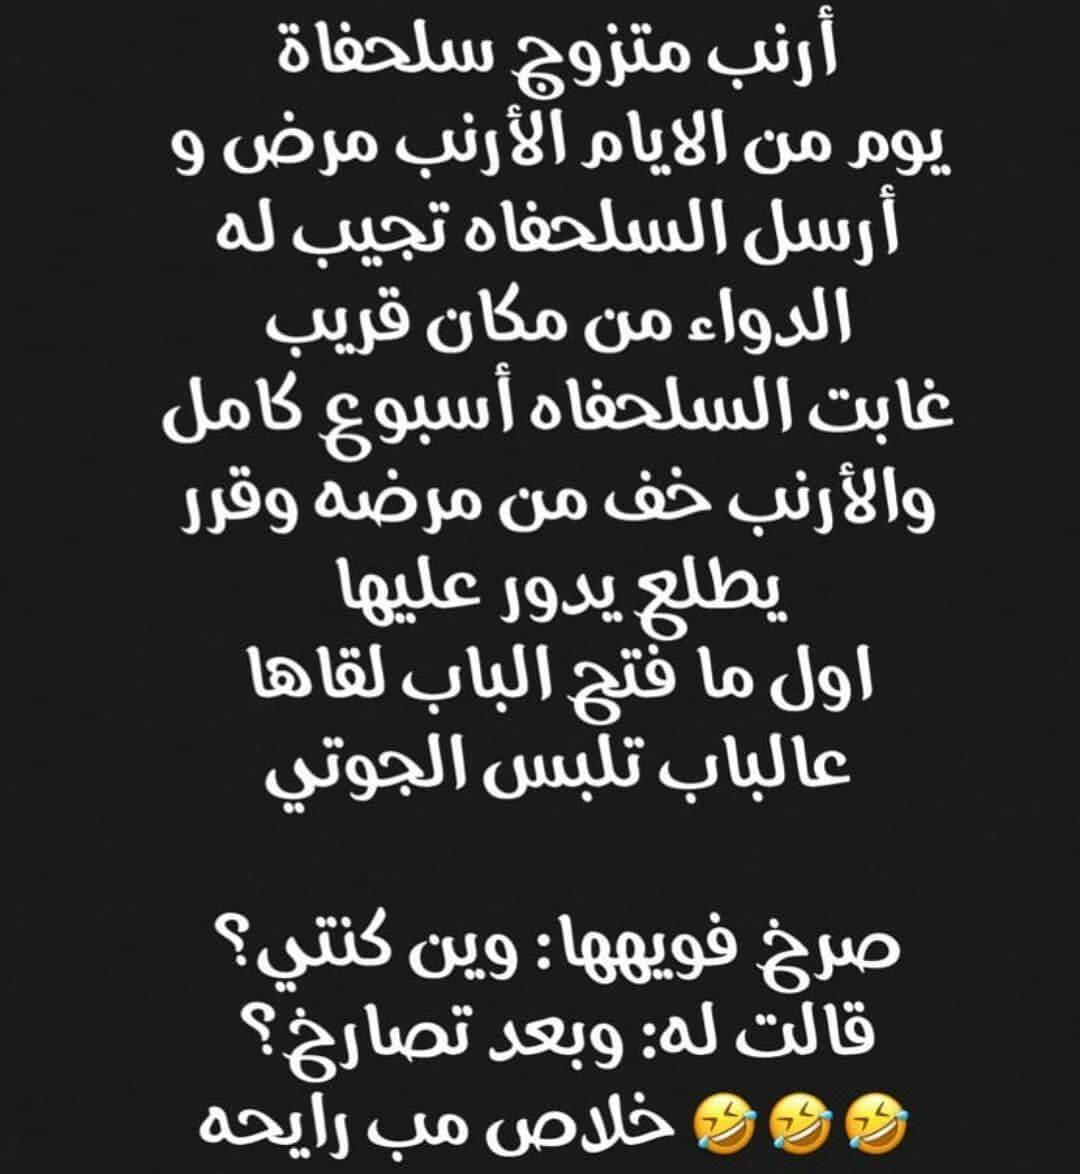 Desertrose Hehehe Funny Qoutes Arabic Jokes Arabic Funny